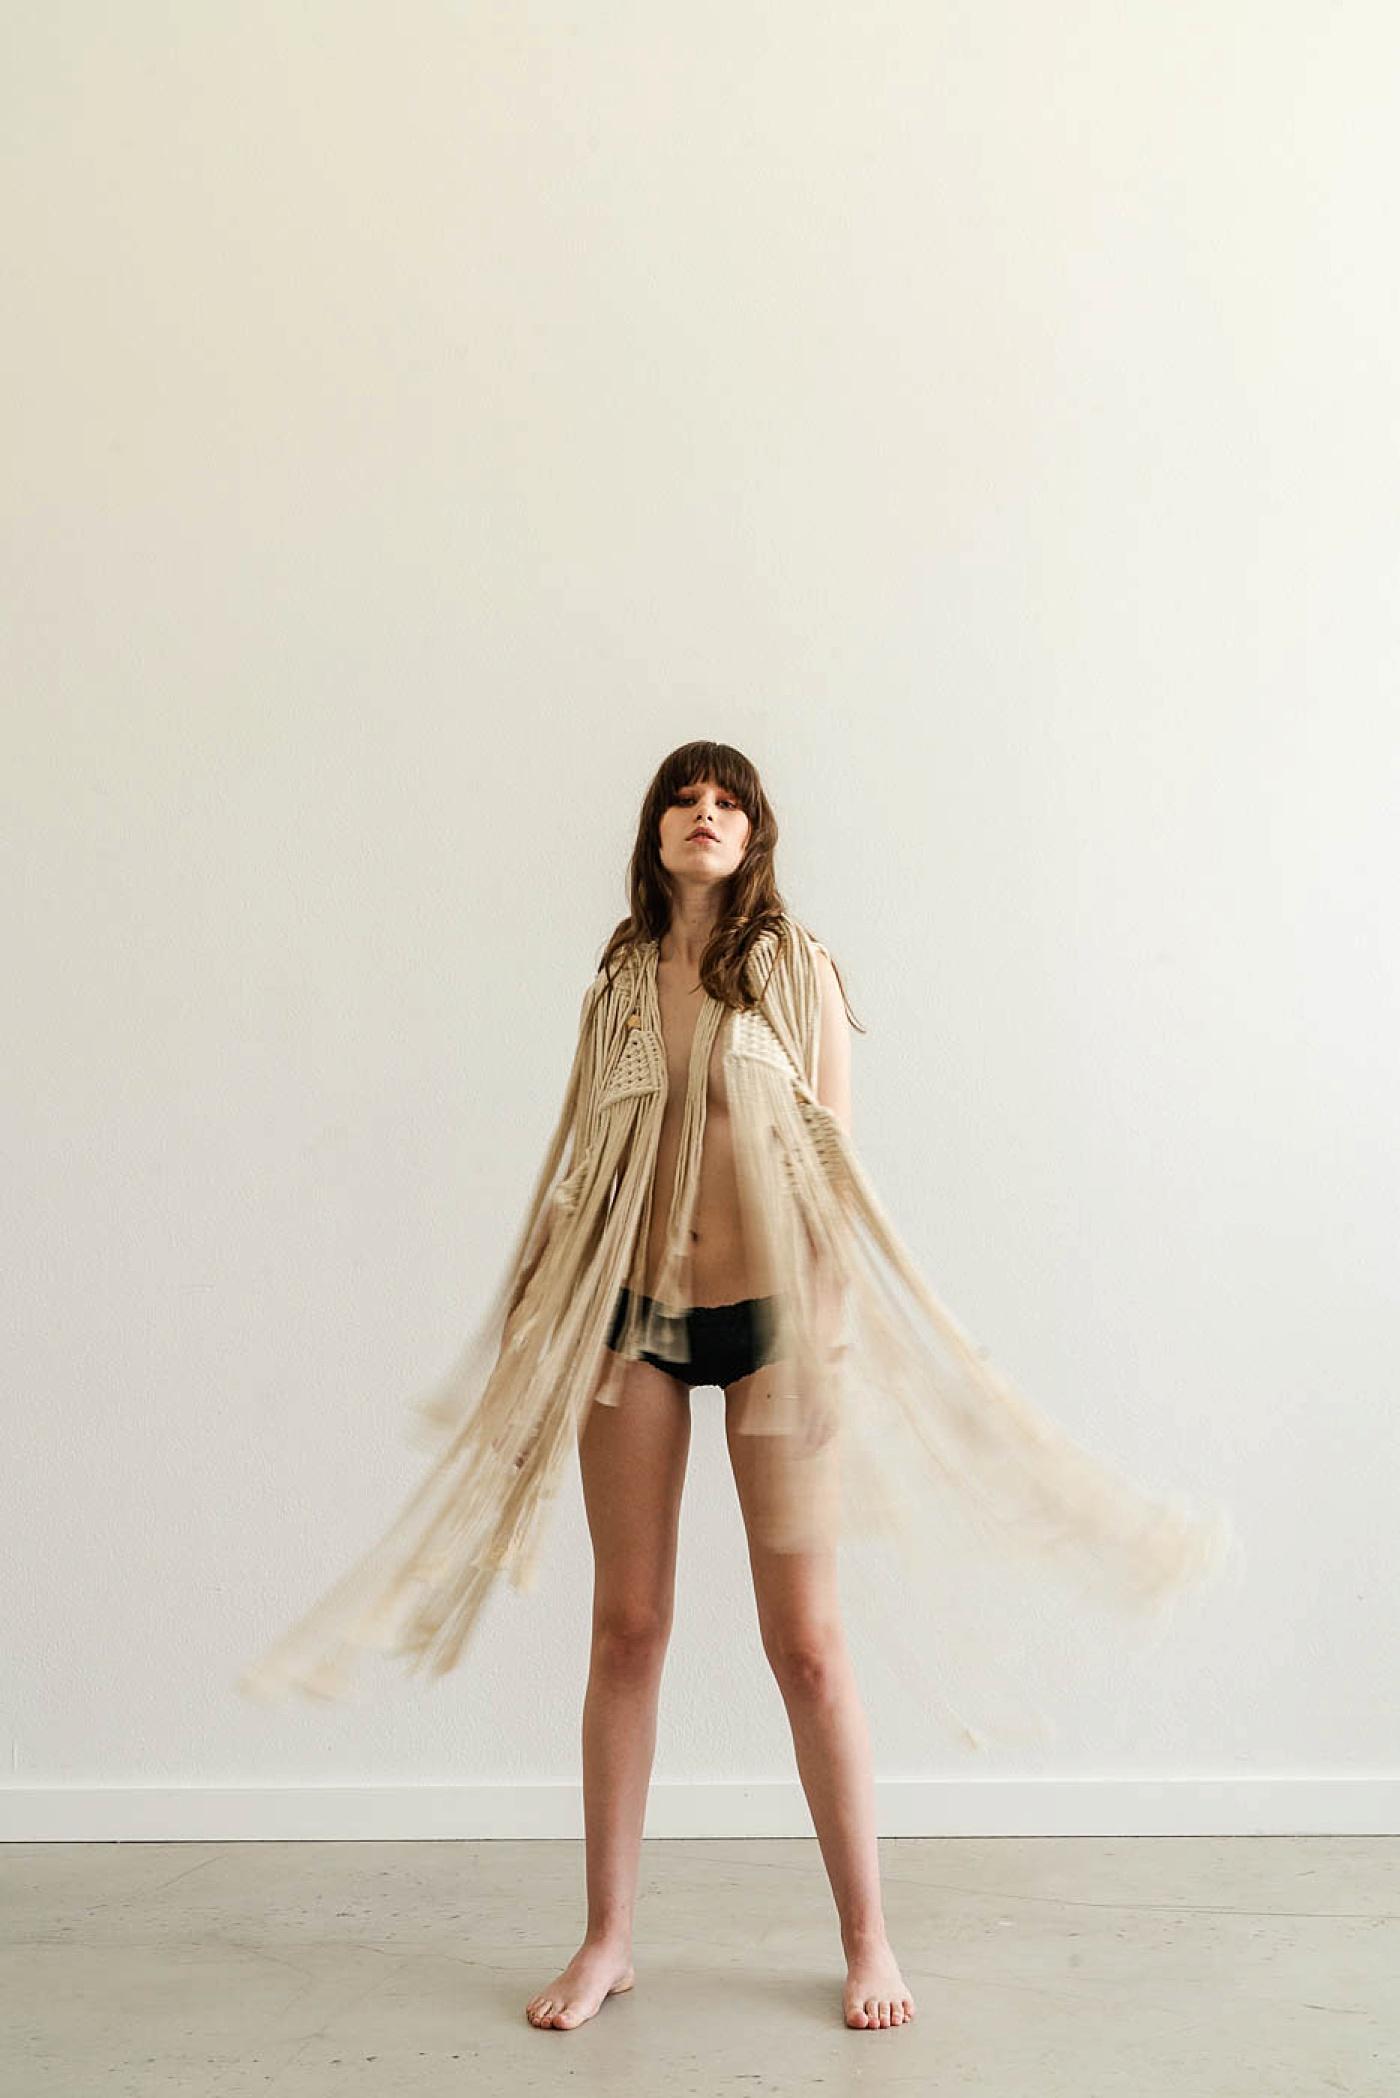 editorial_boudoir_photo_shoot_austin_tx_0515.jpg